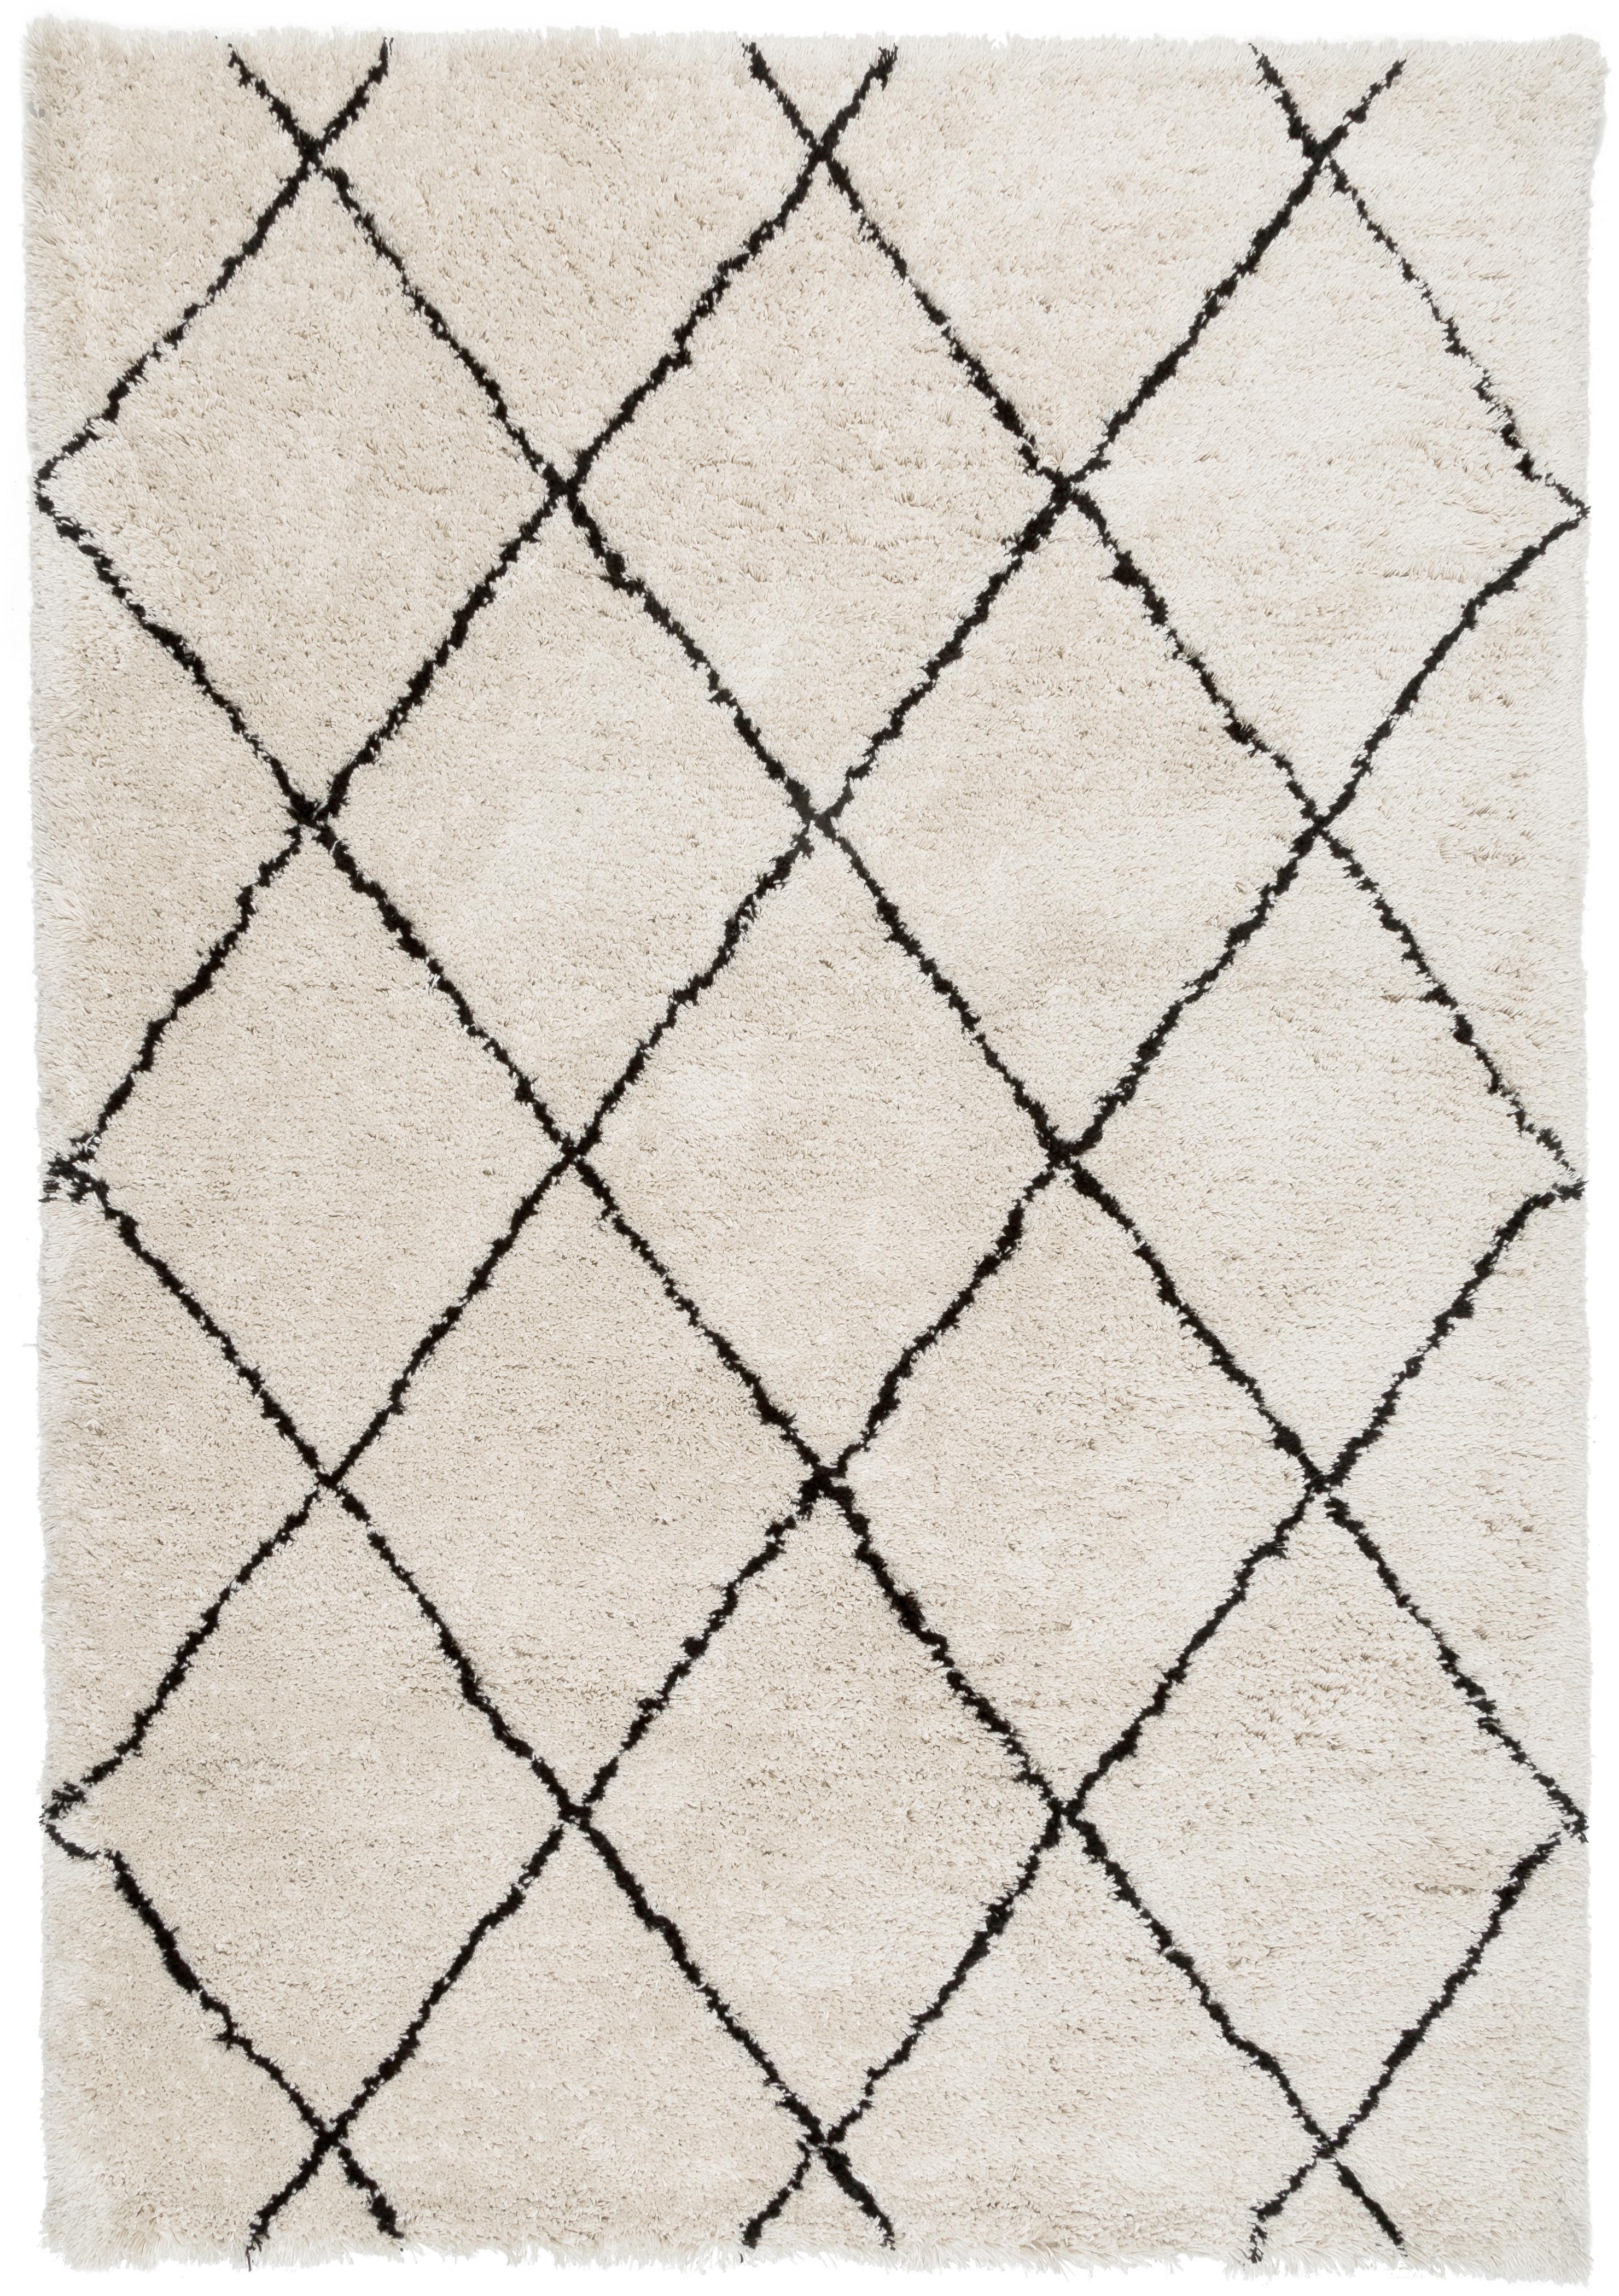 Alfombra artesanal de pelo largo Naima, Parte superior: 100%poliéster., Reverso: 100%algodón, Beige, negro, An 160 x L 230 cm (Tamaño M)